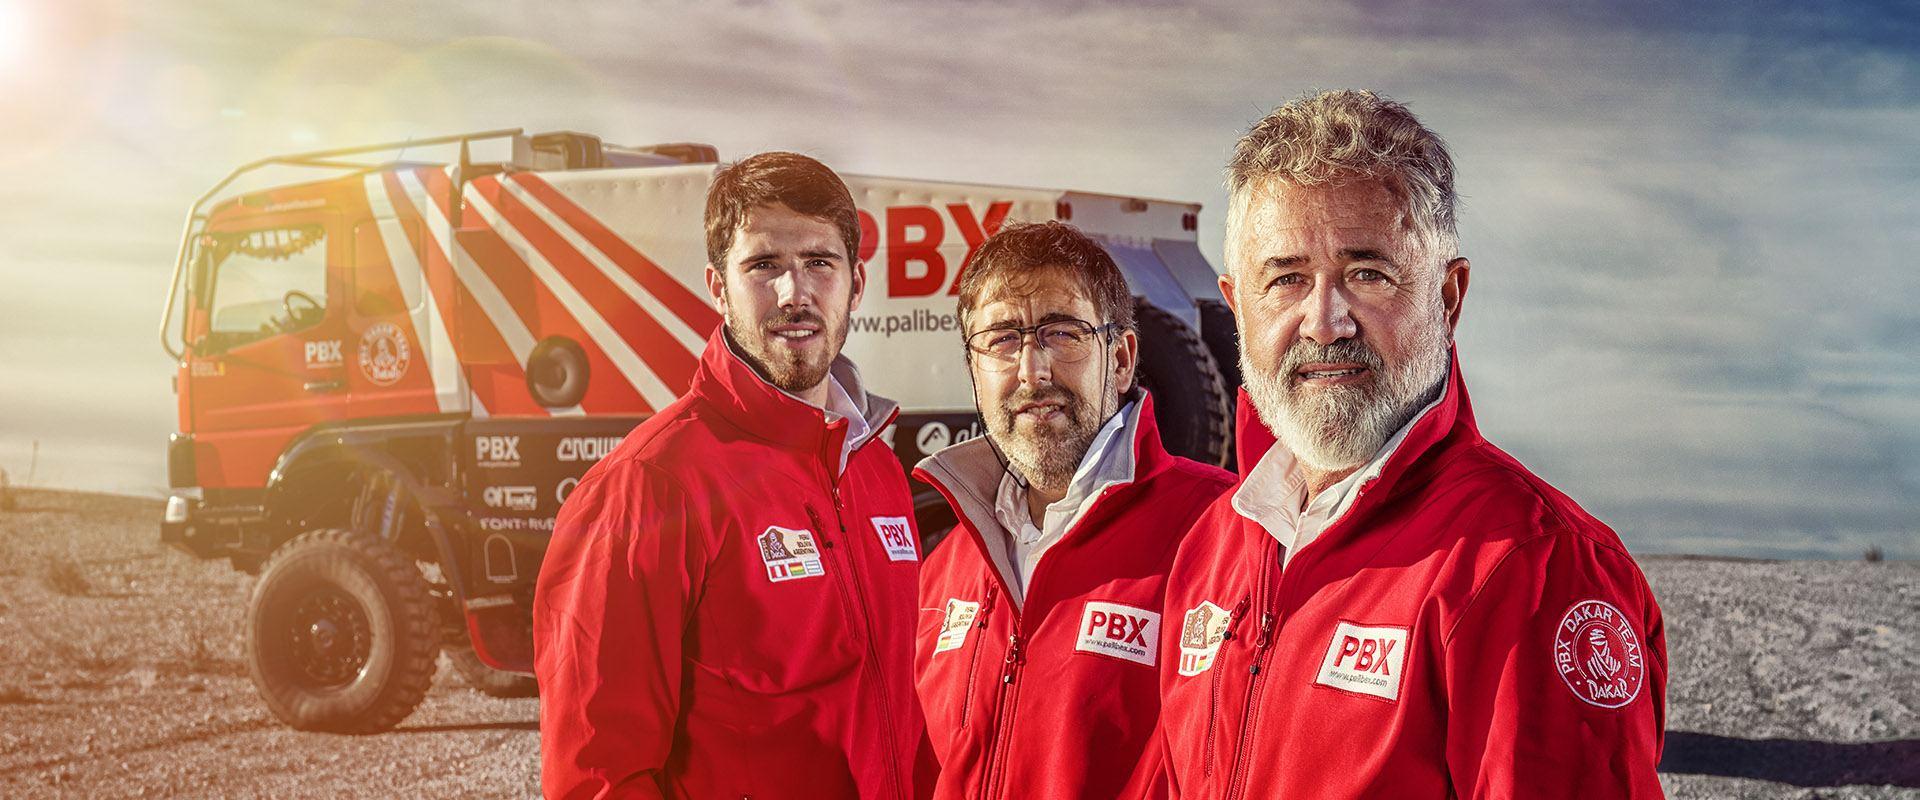 Éxito del PBX Dakar Team